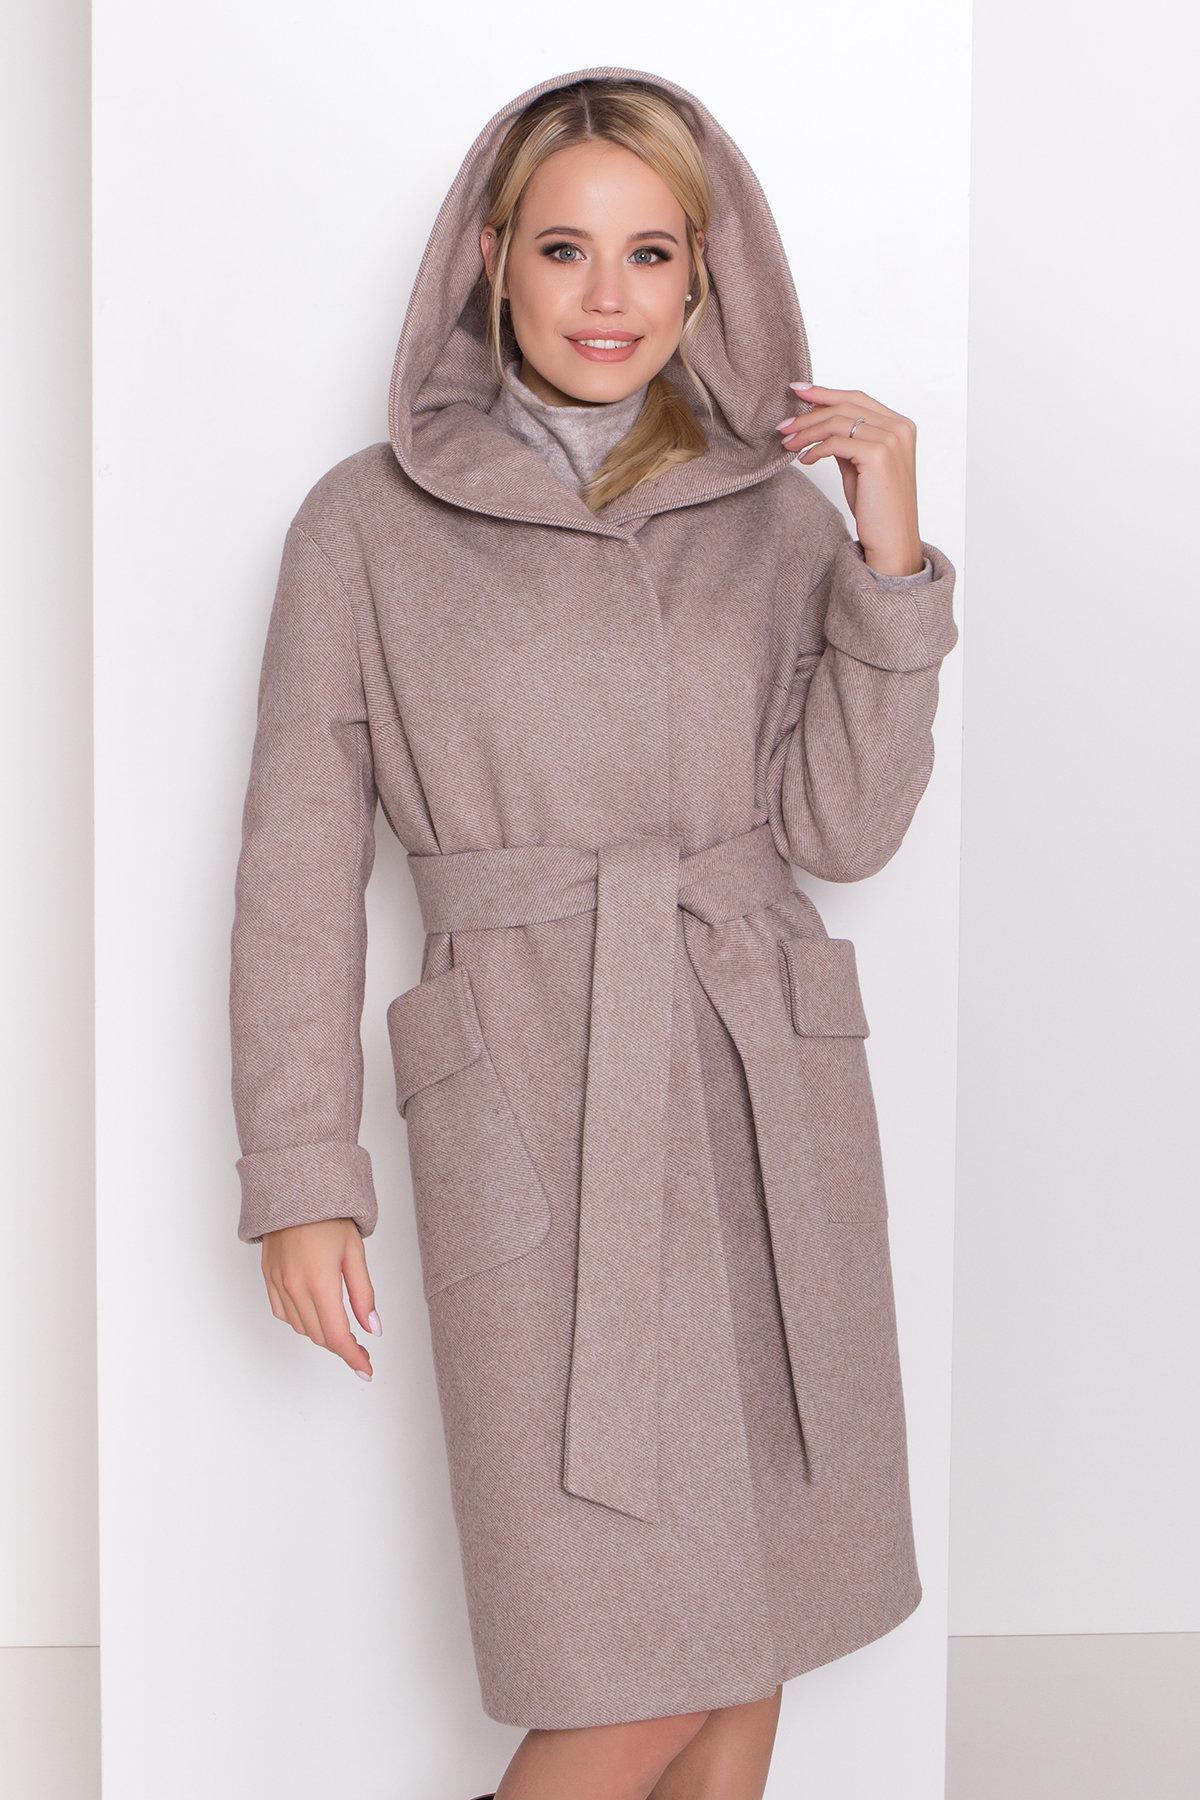 Пальто зима Анджи 8455 АРТ. 44727 Цвет: Бежевый меланж - фото 5, интернет магазин tm-modus.ru